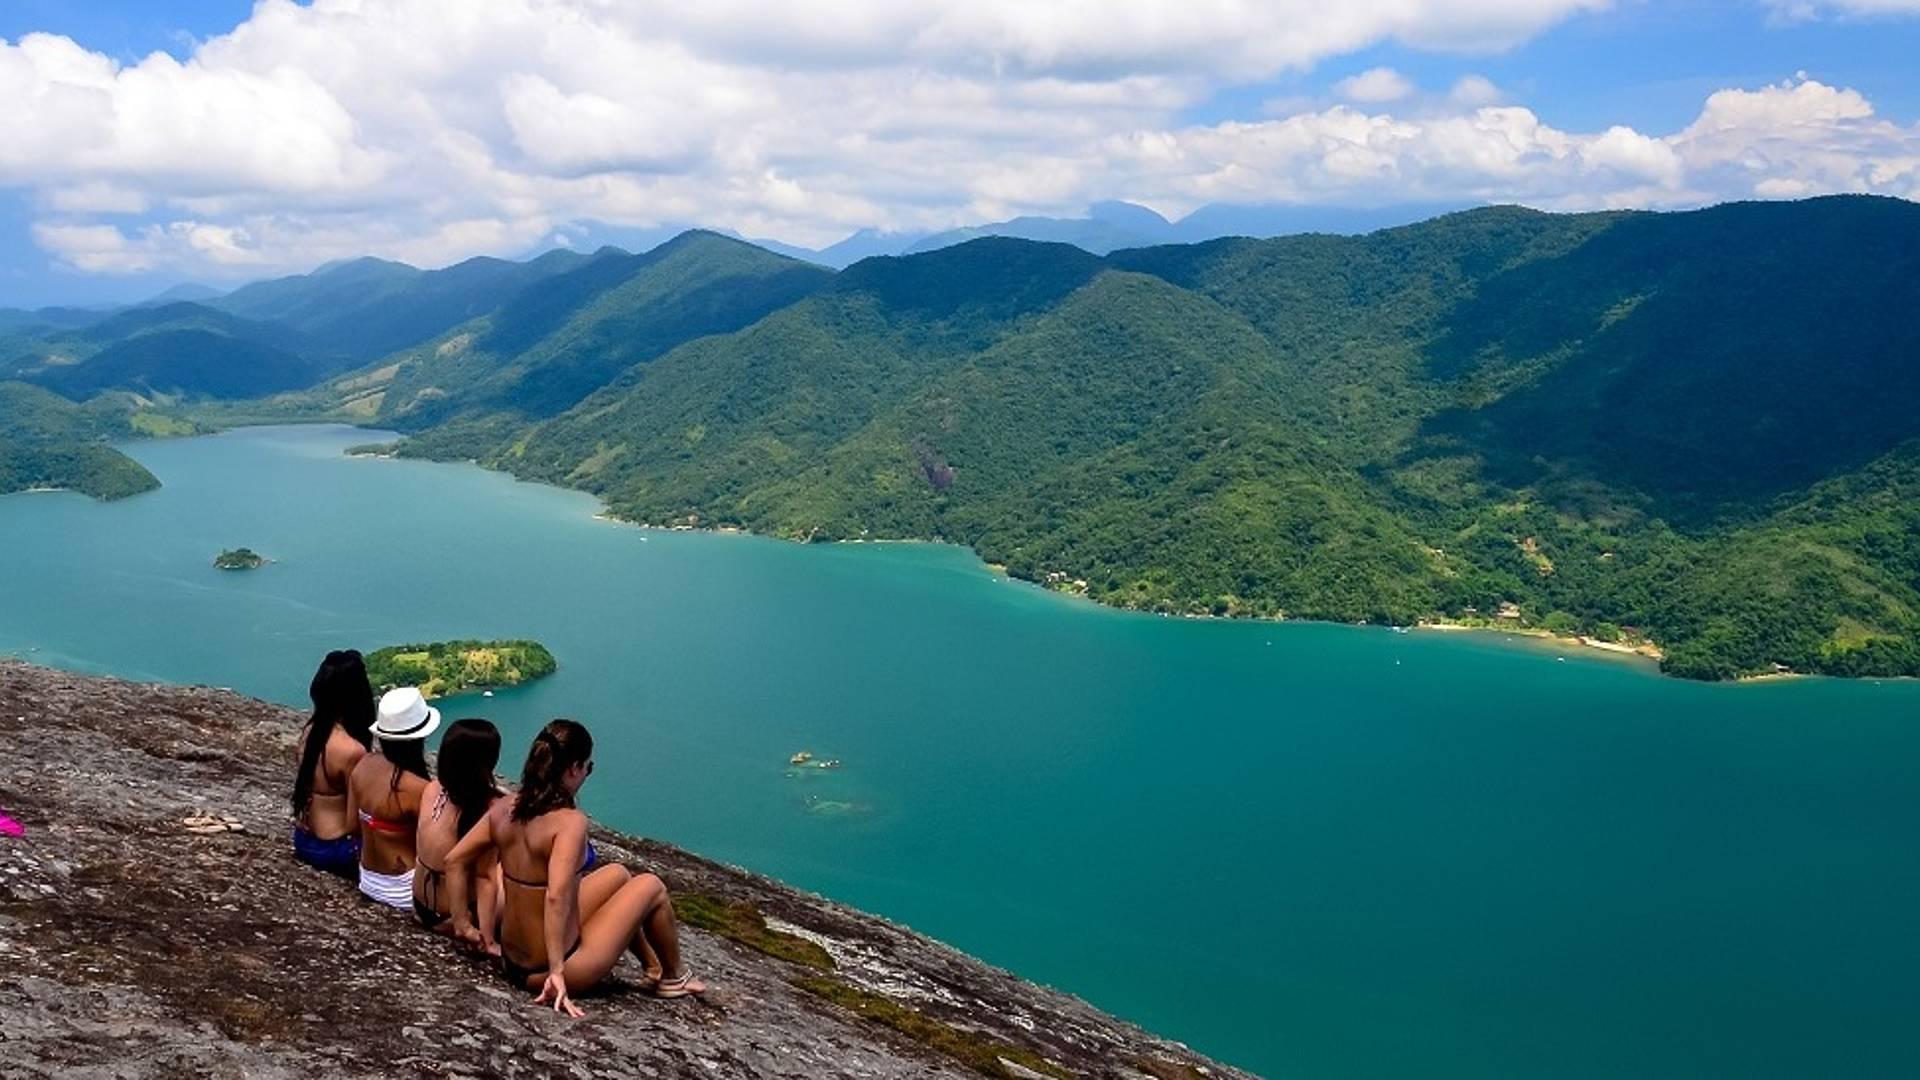 Merveilles naturelles du Brésil